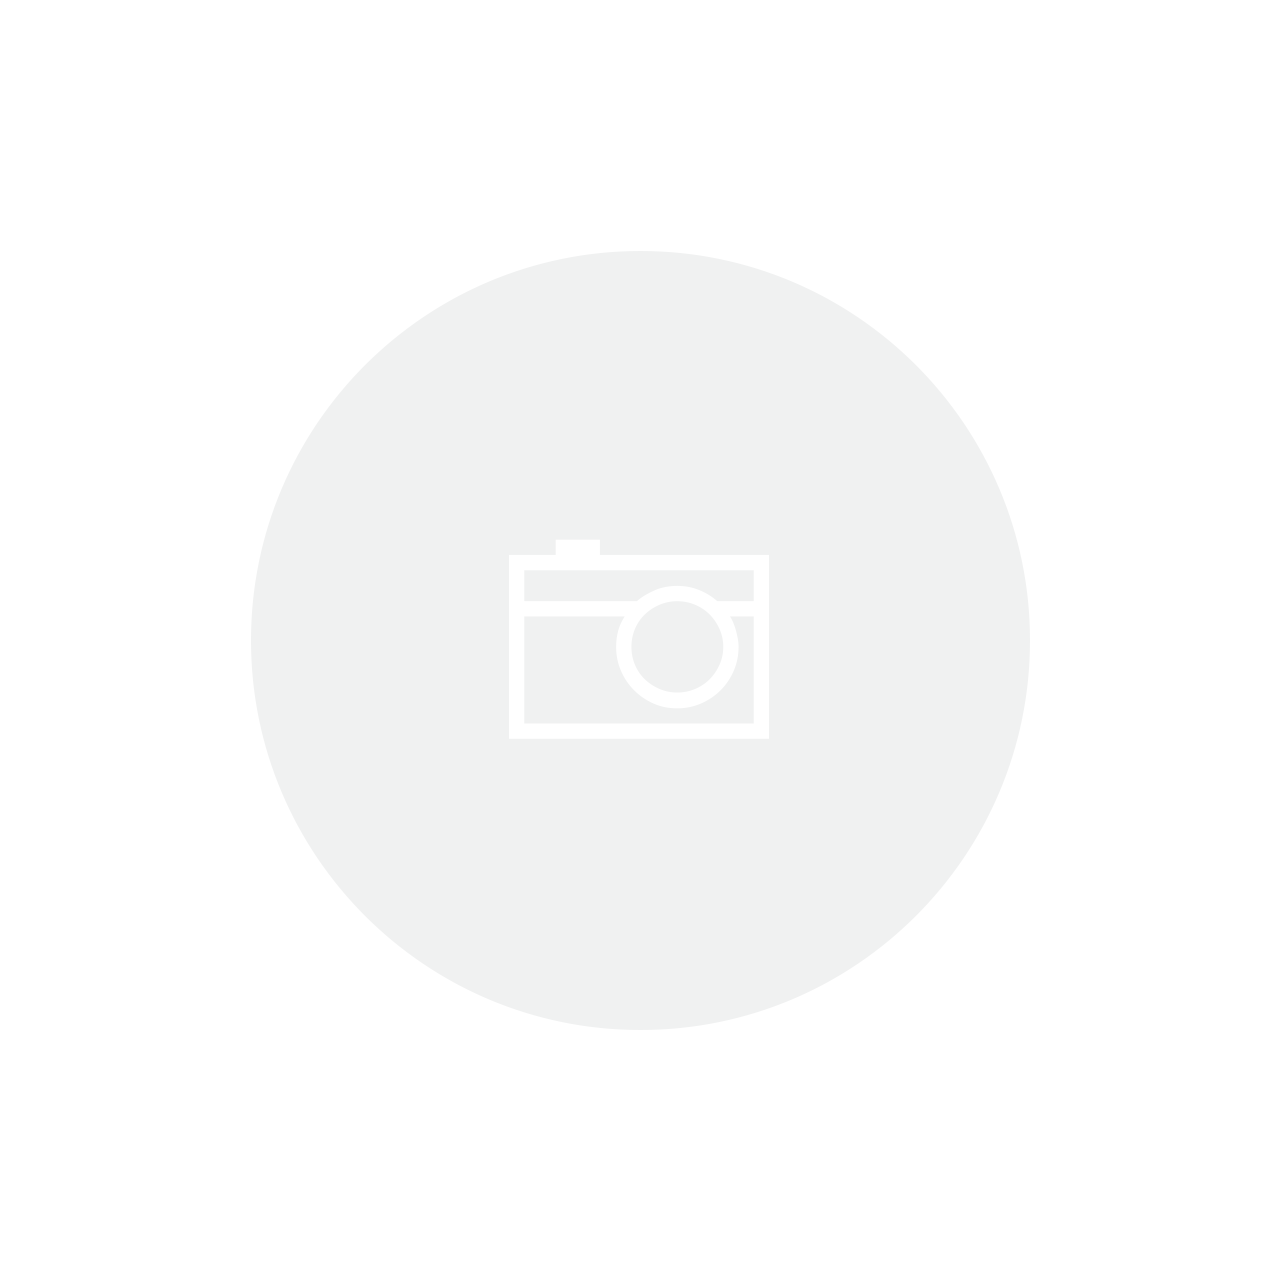 Colher de Mesa Aço Inox Classic Tramontina